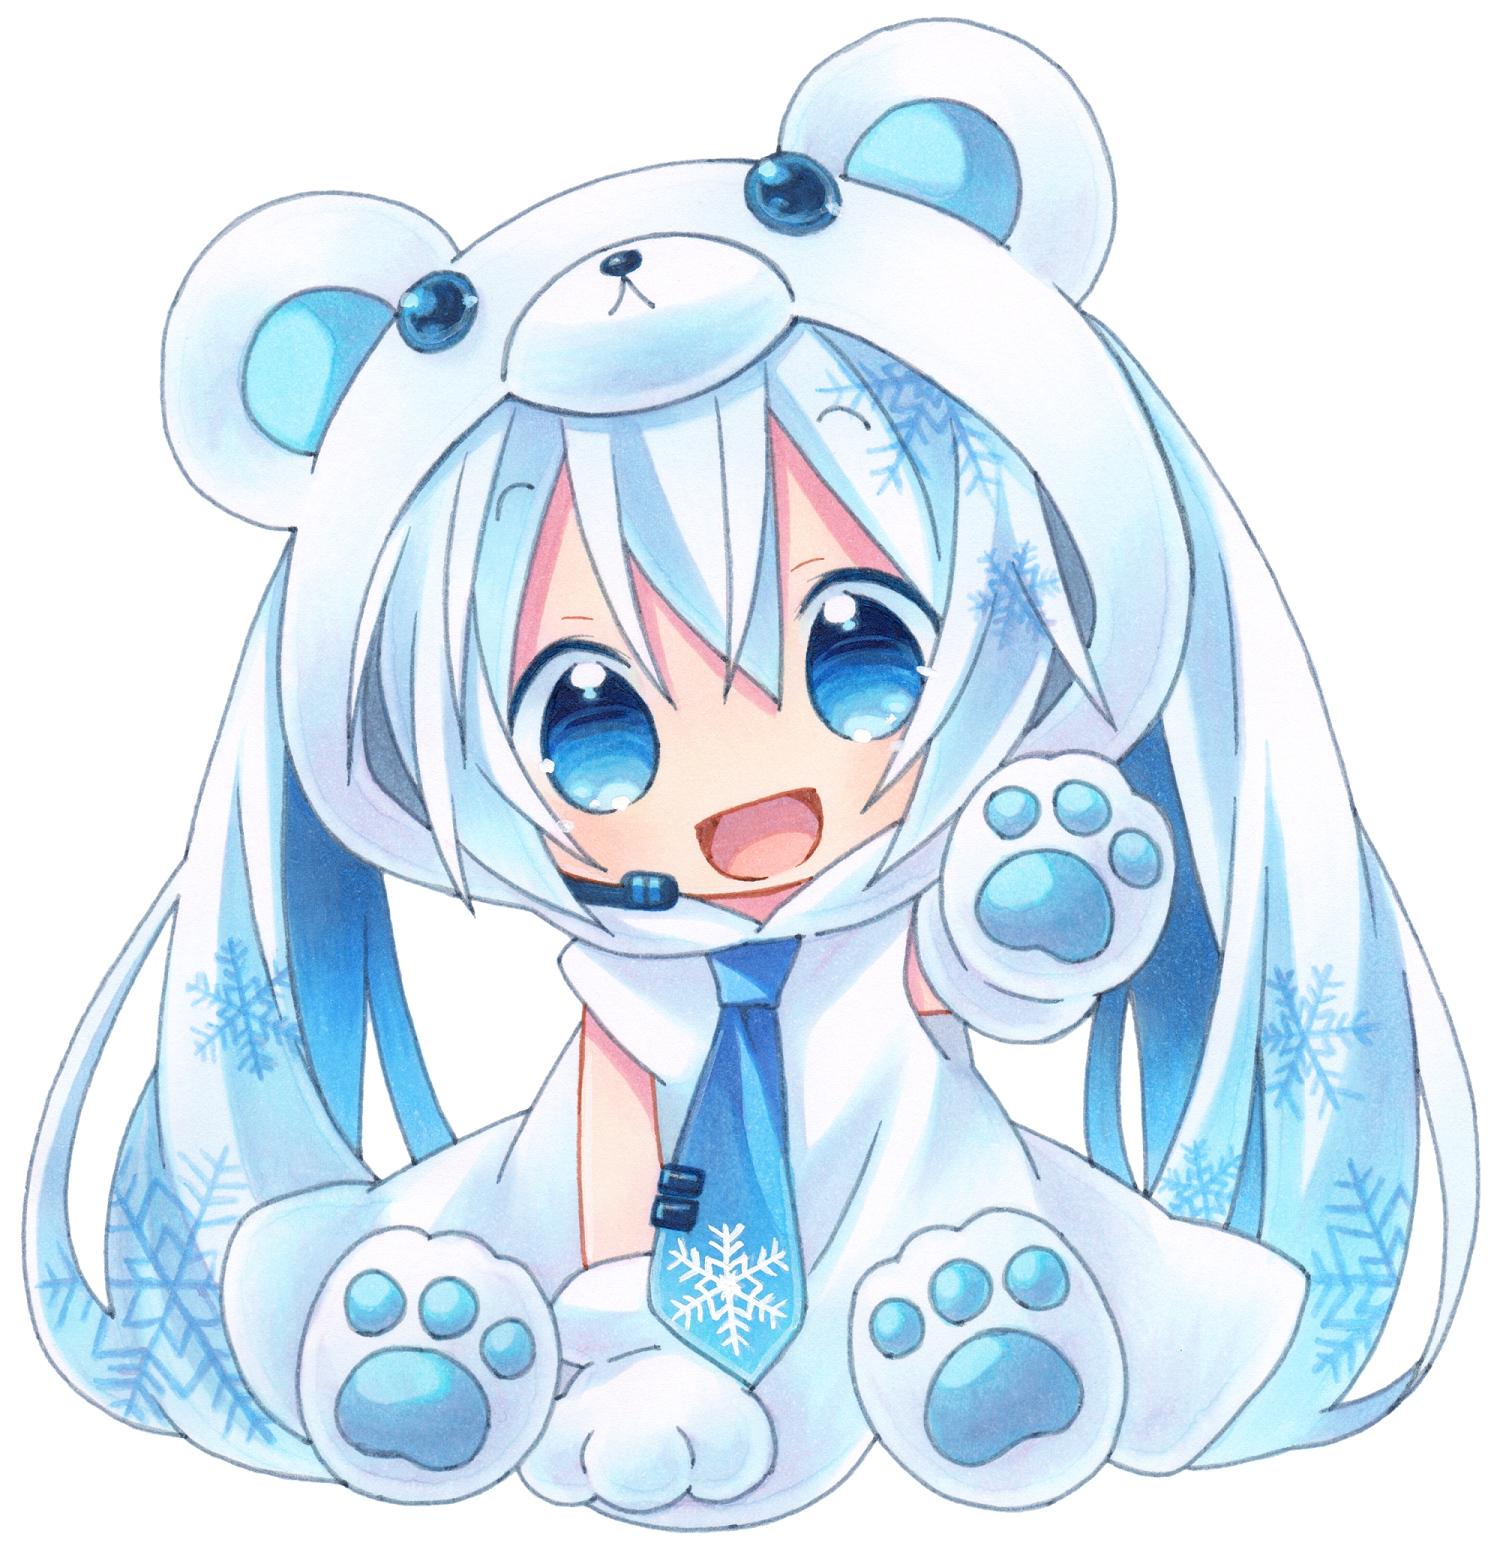 Anime lighthouse hatsune miku is in s o s 0o0 - Cute anime miku ...